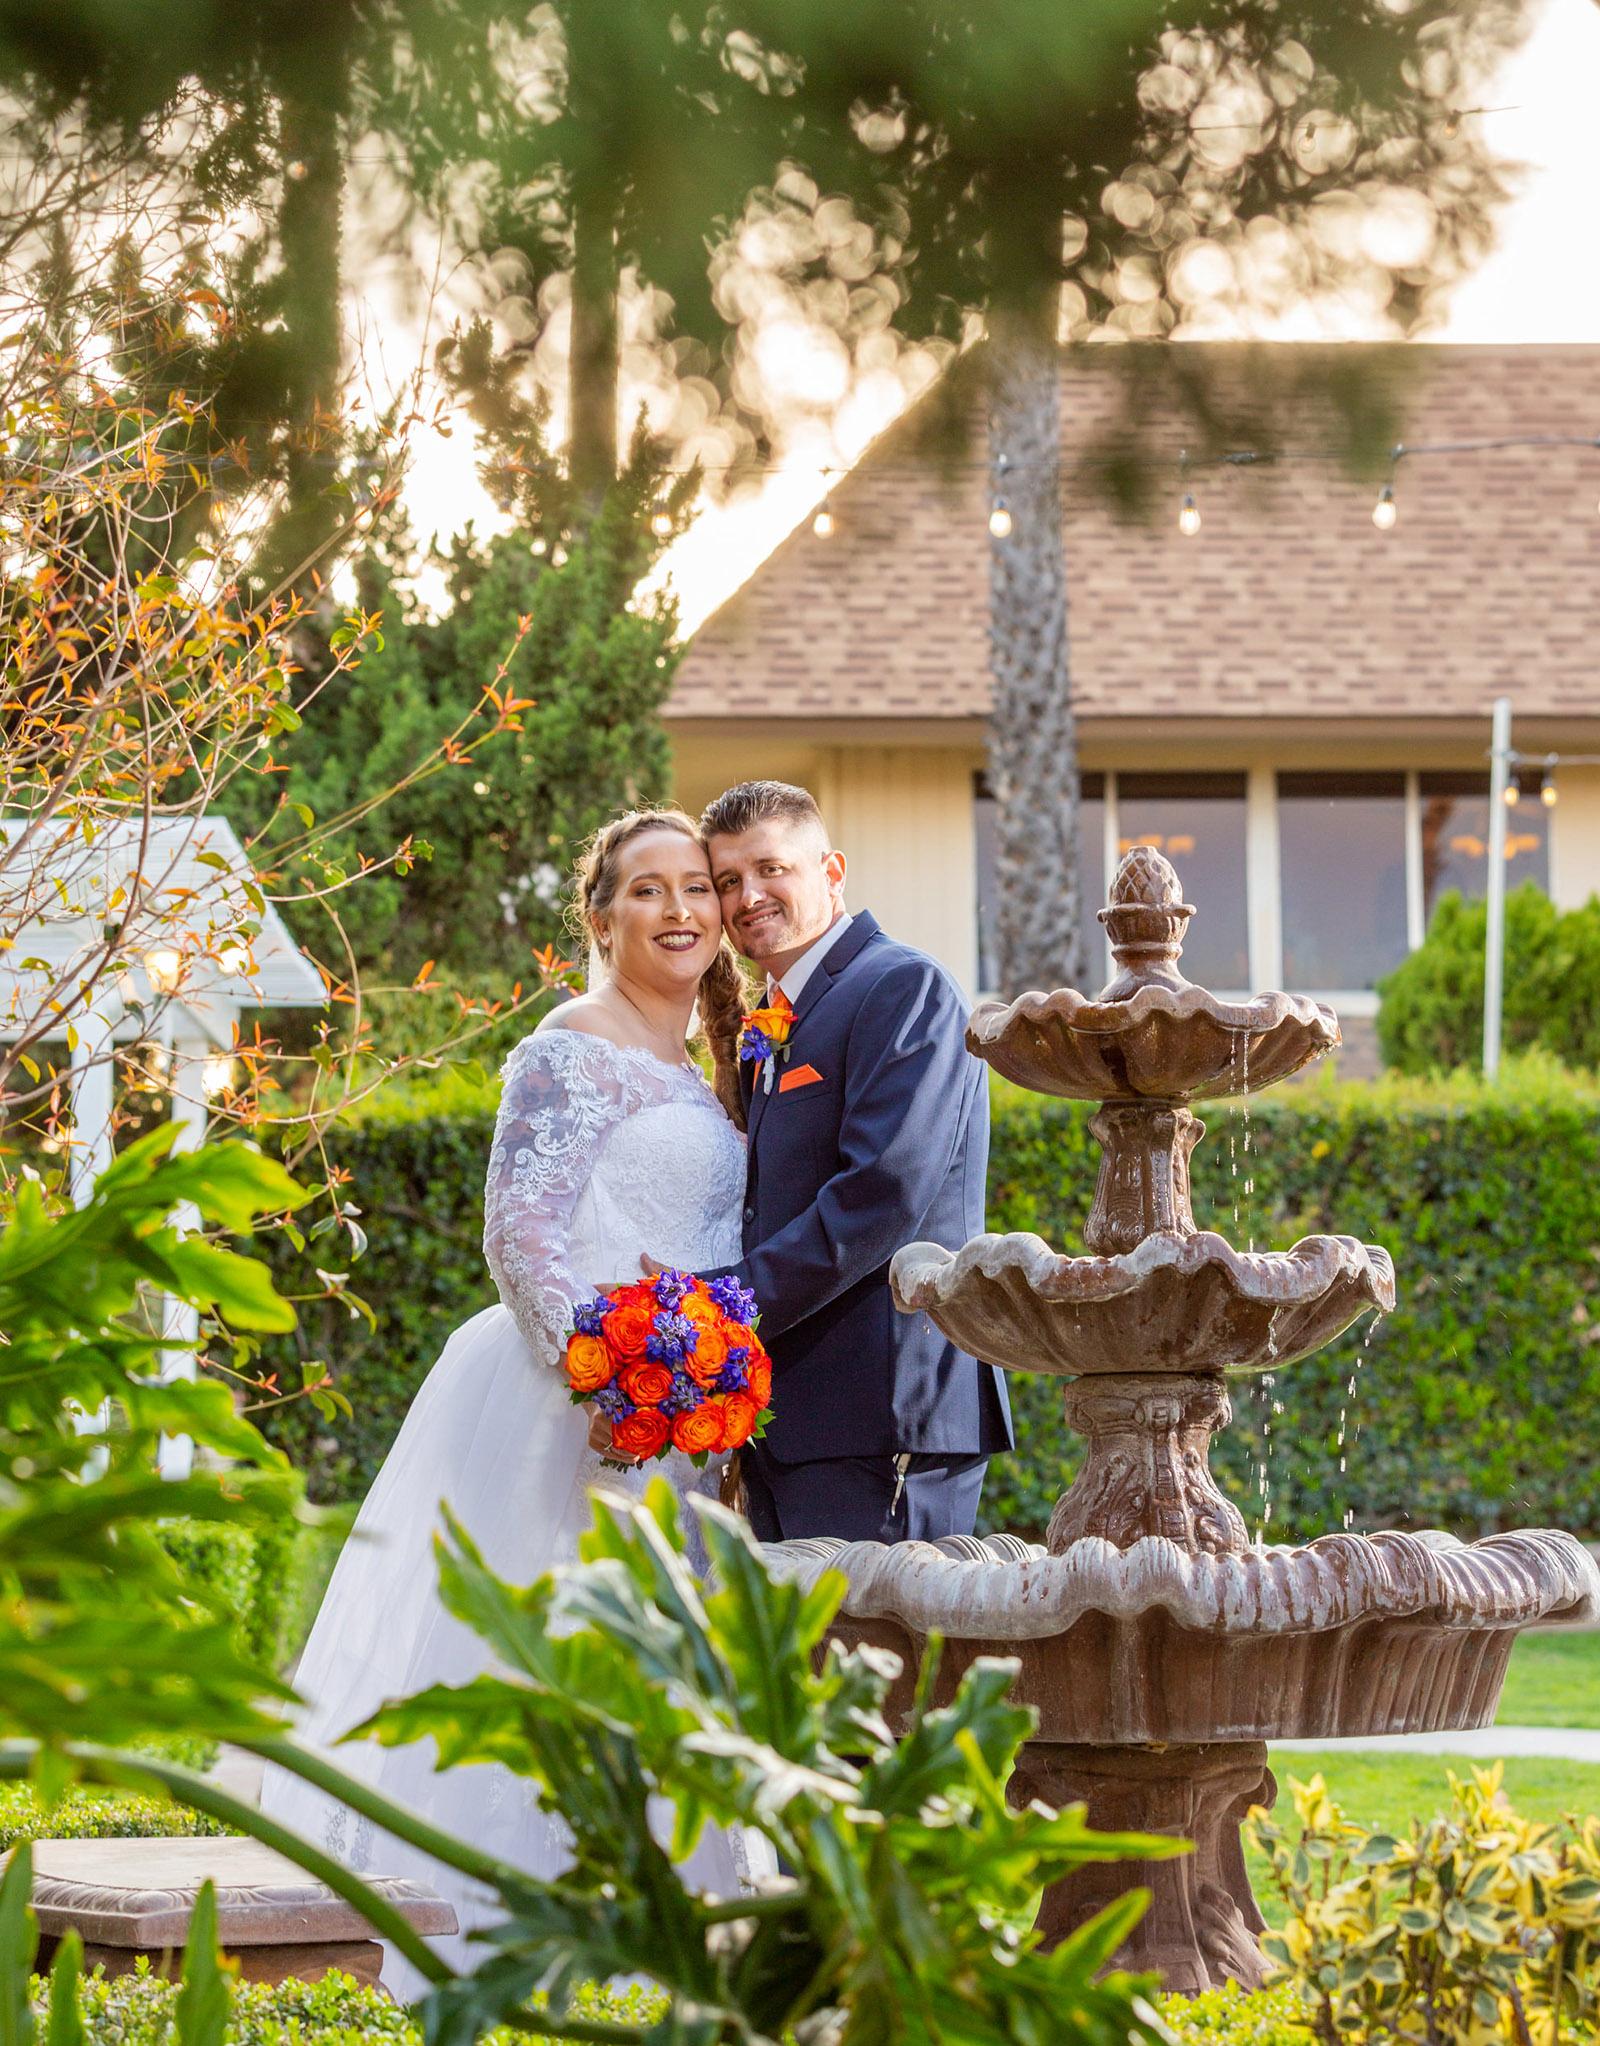 Fountain Couple - Indian Hills - Riverside, California - Riverside County - Wedgewood Weddings